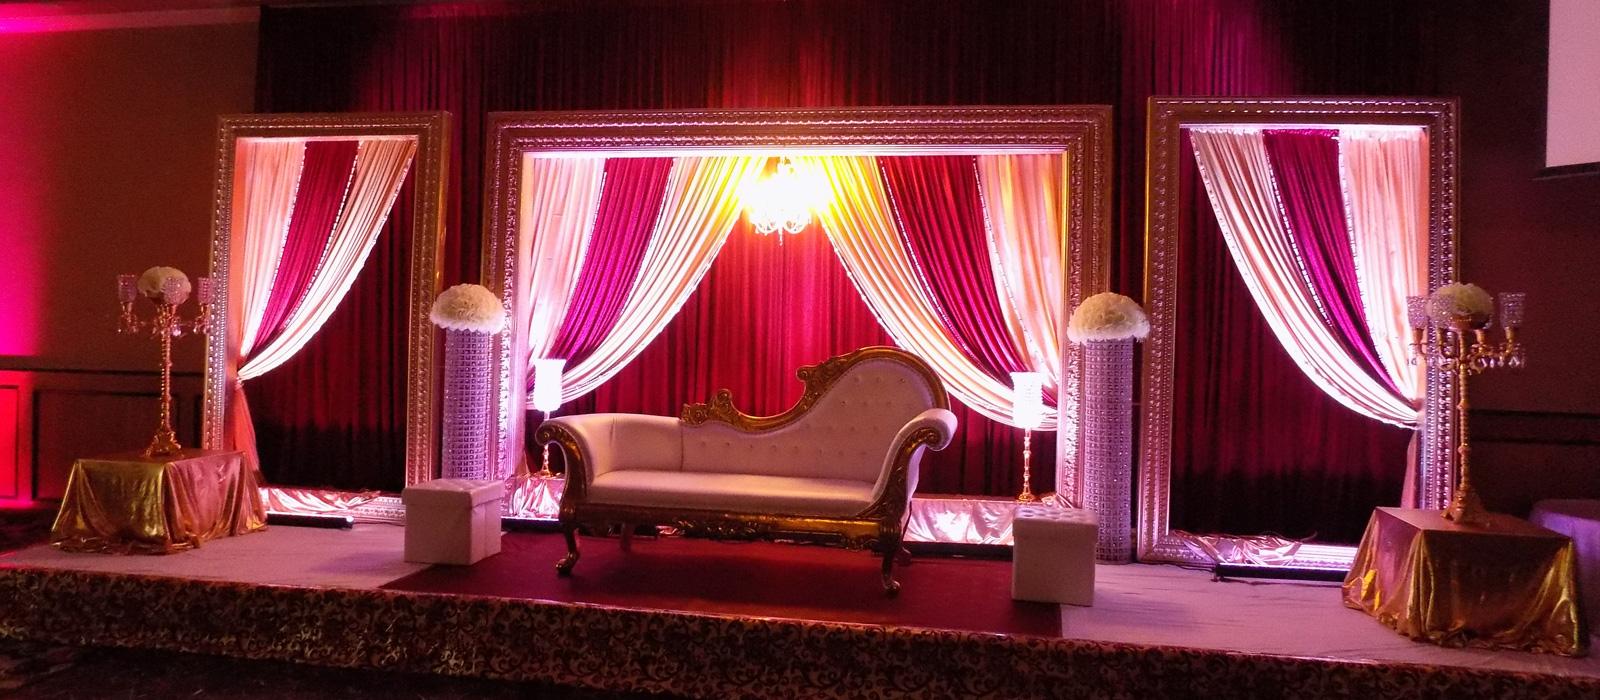 Edmonton Banquet Hall